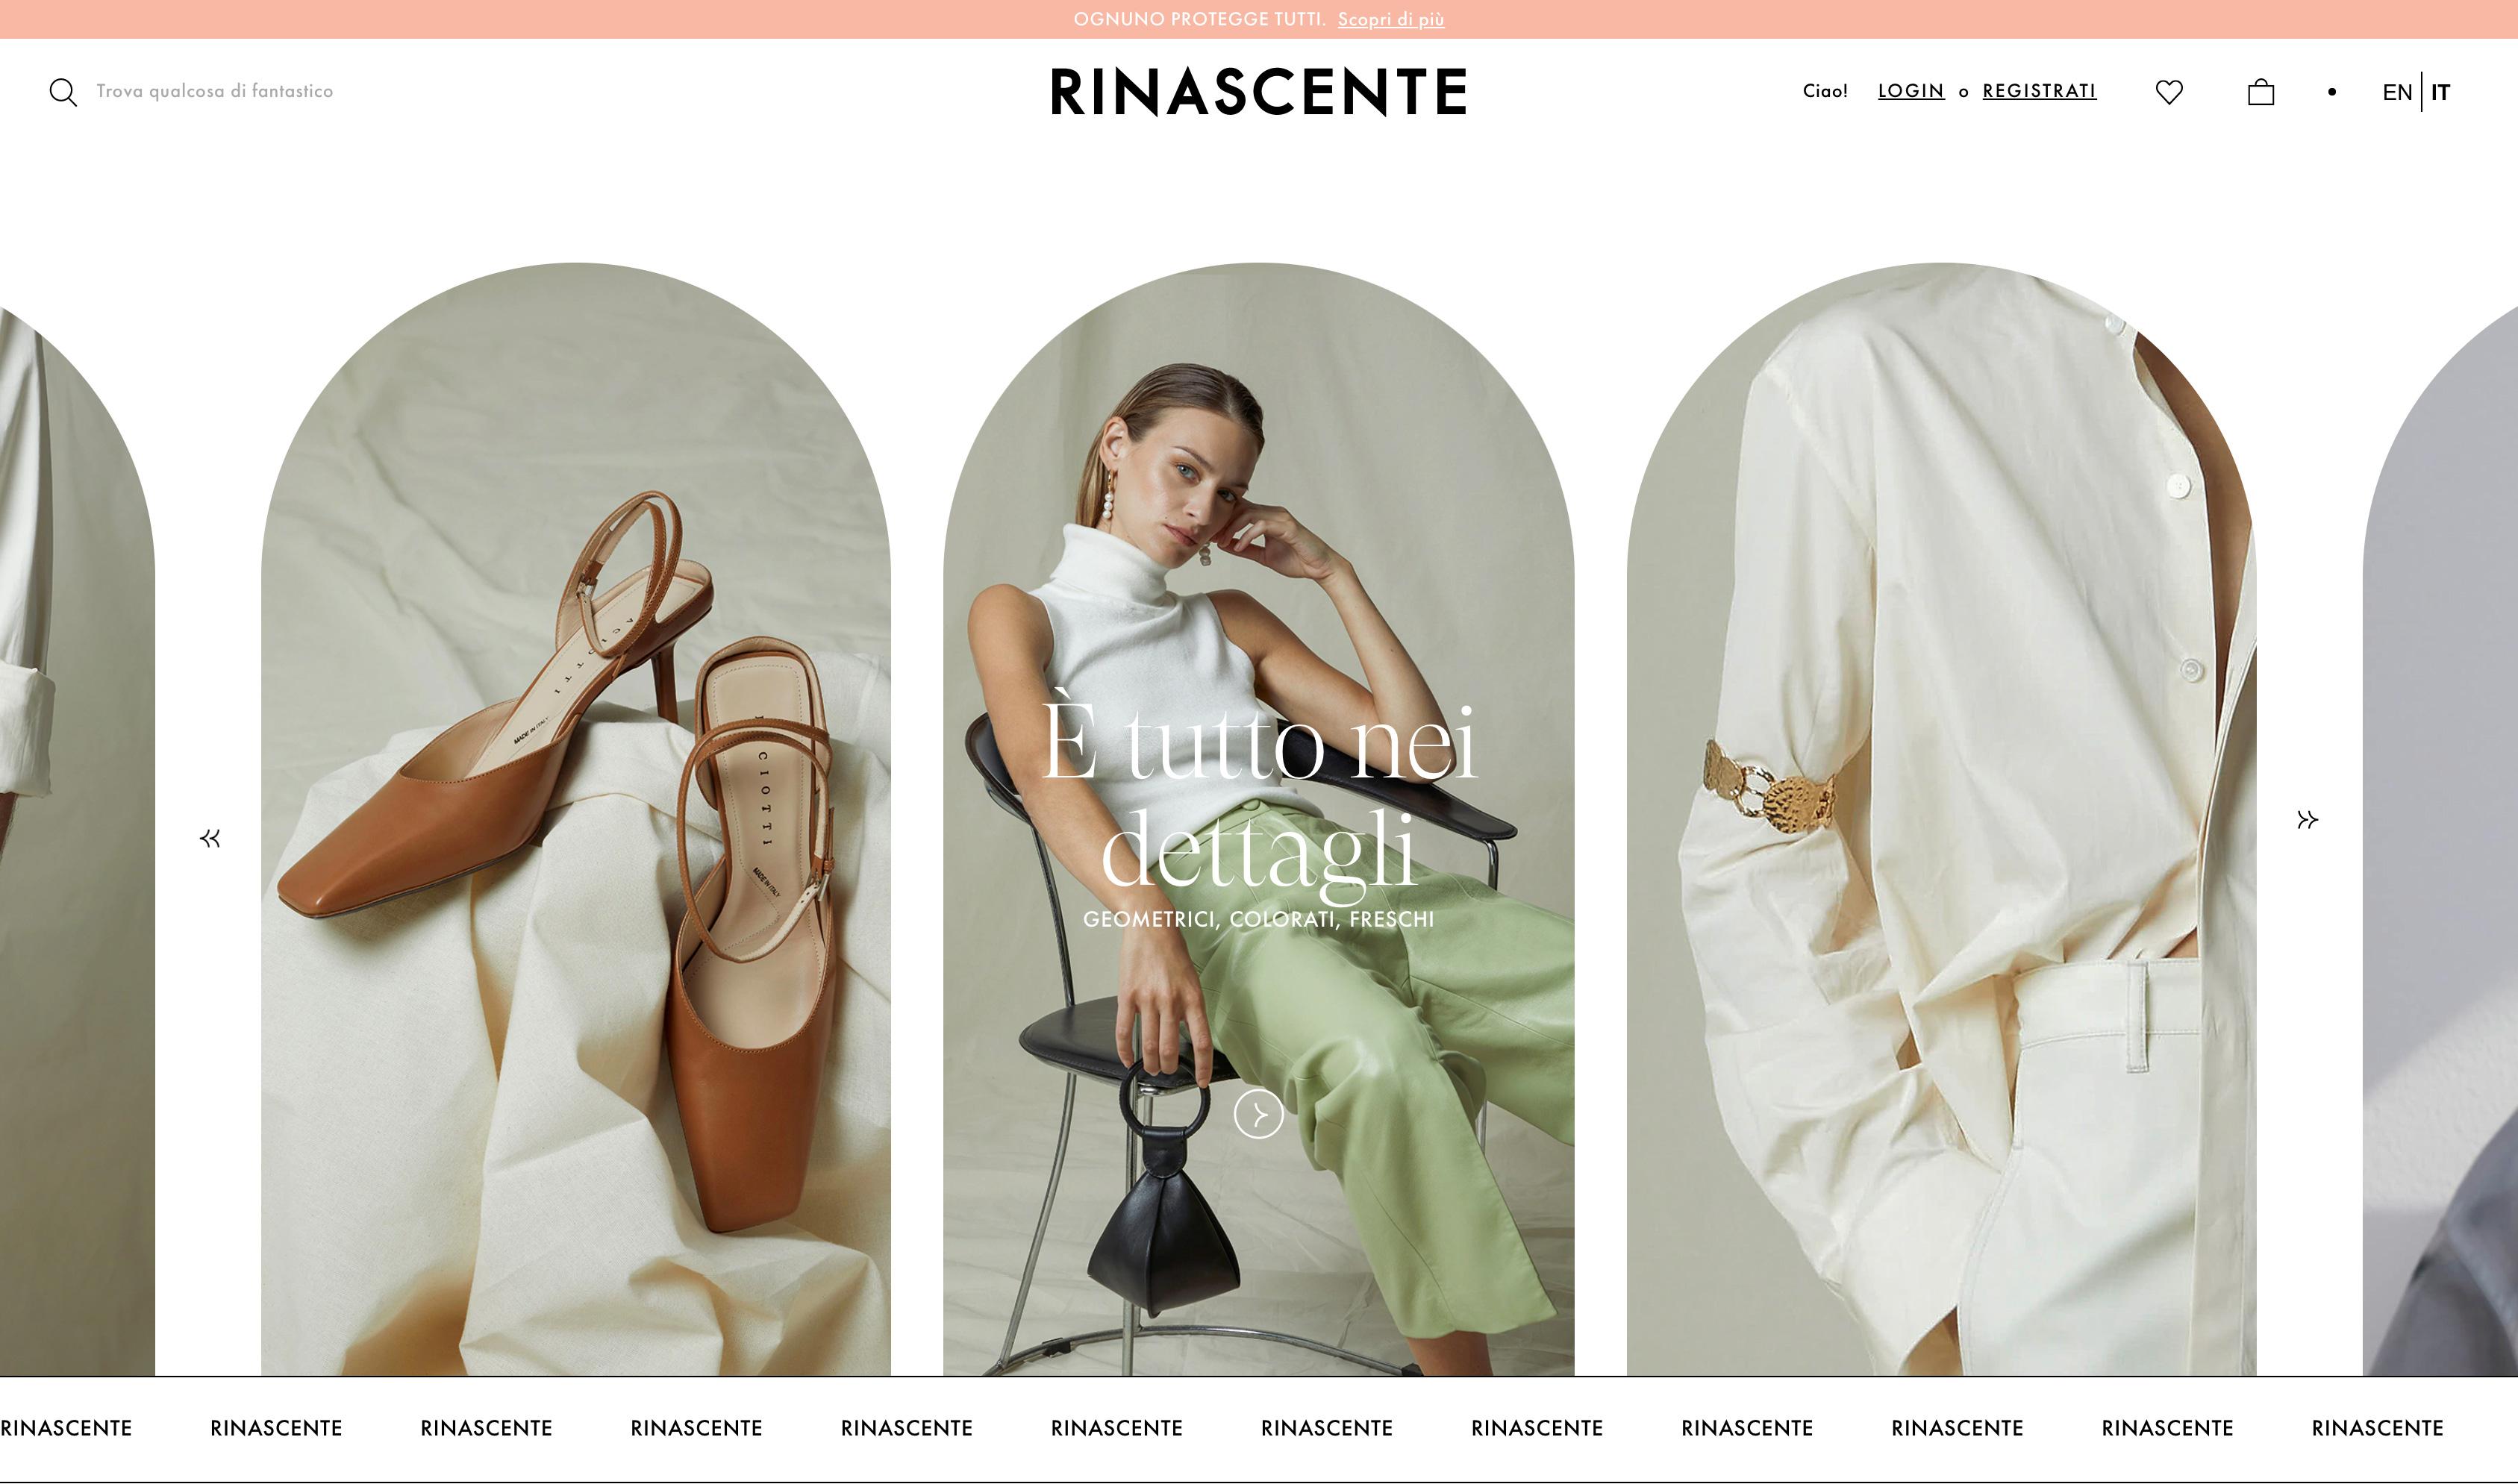 Rinascente online store